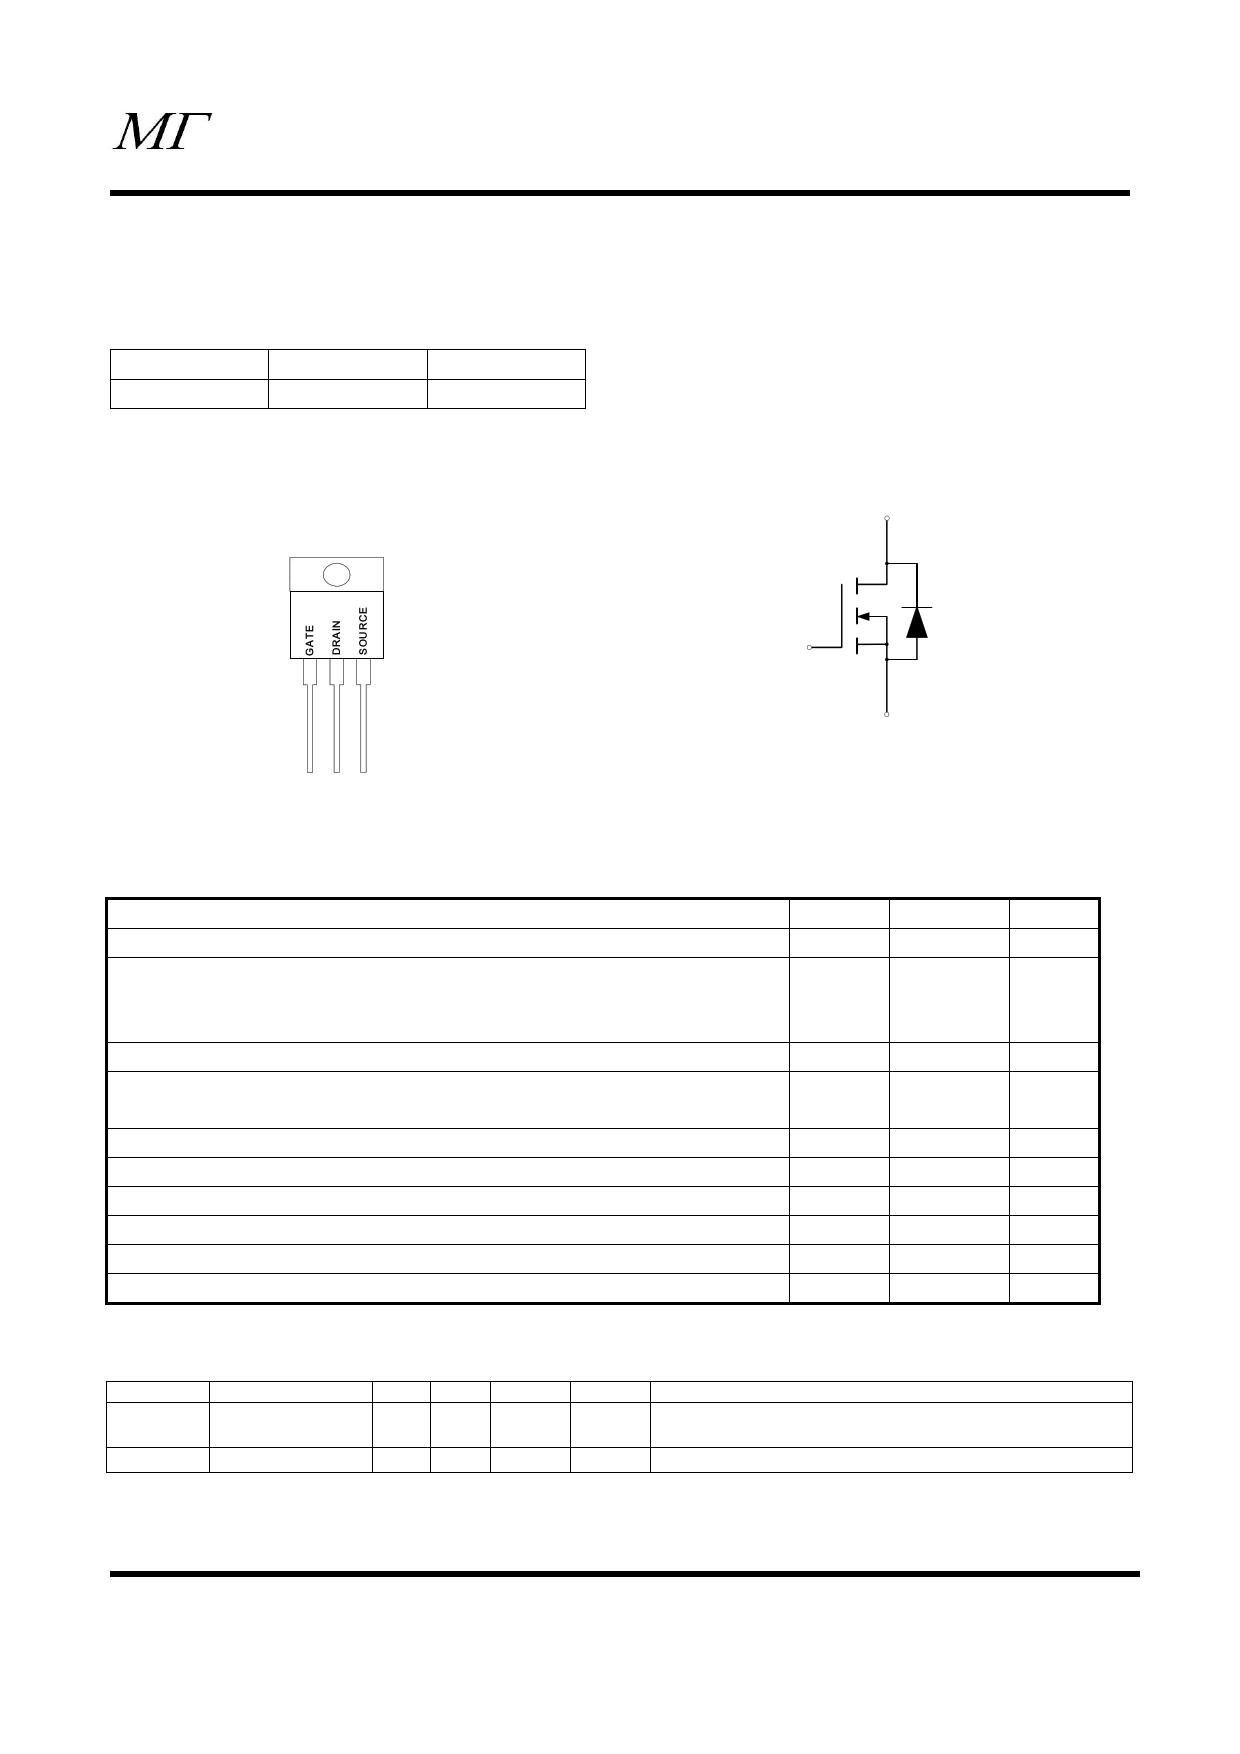 IRFZ44N Datasheet, IRFZ44N PDF,ピン配置, 機能